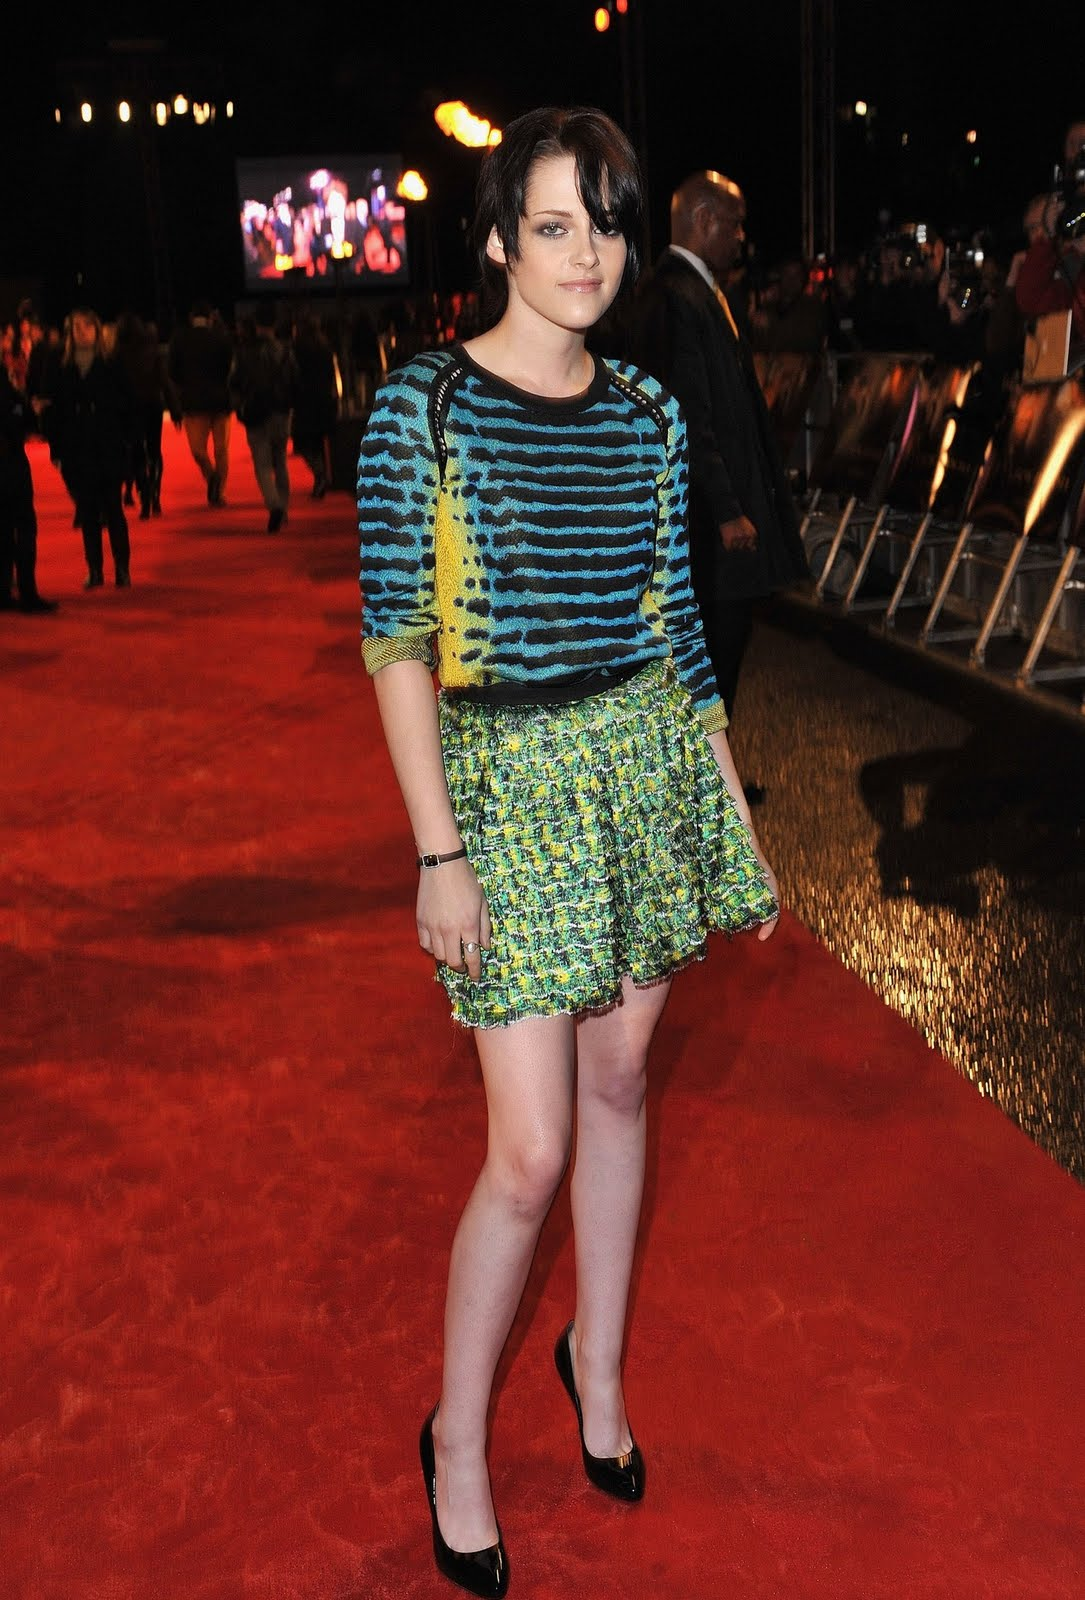 http://3.bp.blogspot.com/_MCy6UZ3NI5M/TGnkepwJ2rI/AAAAAAAAtYw/wkt0pmCSf2I/s1600/70316-kris-dress-red-uk-premiere-01-122-600lo.jpg